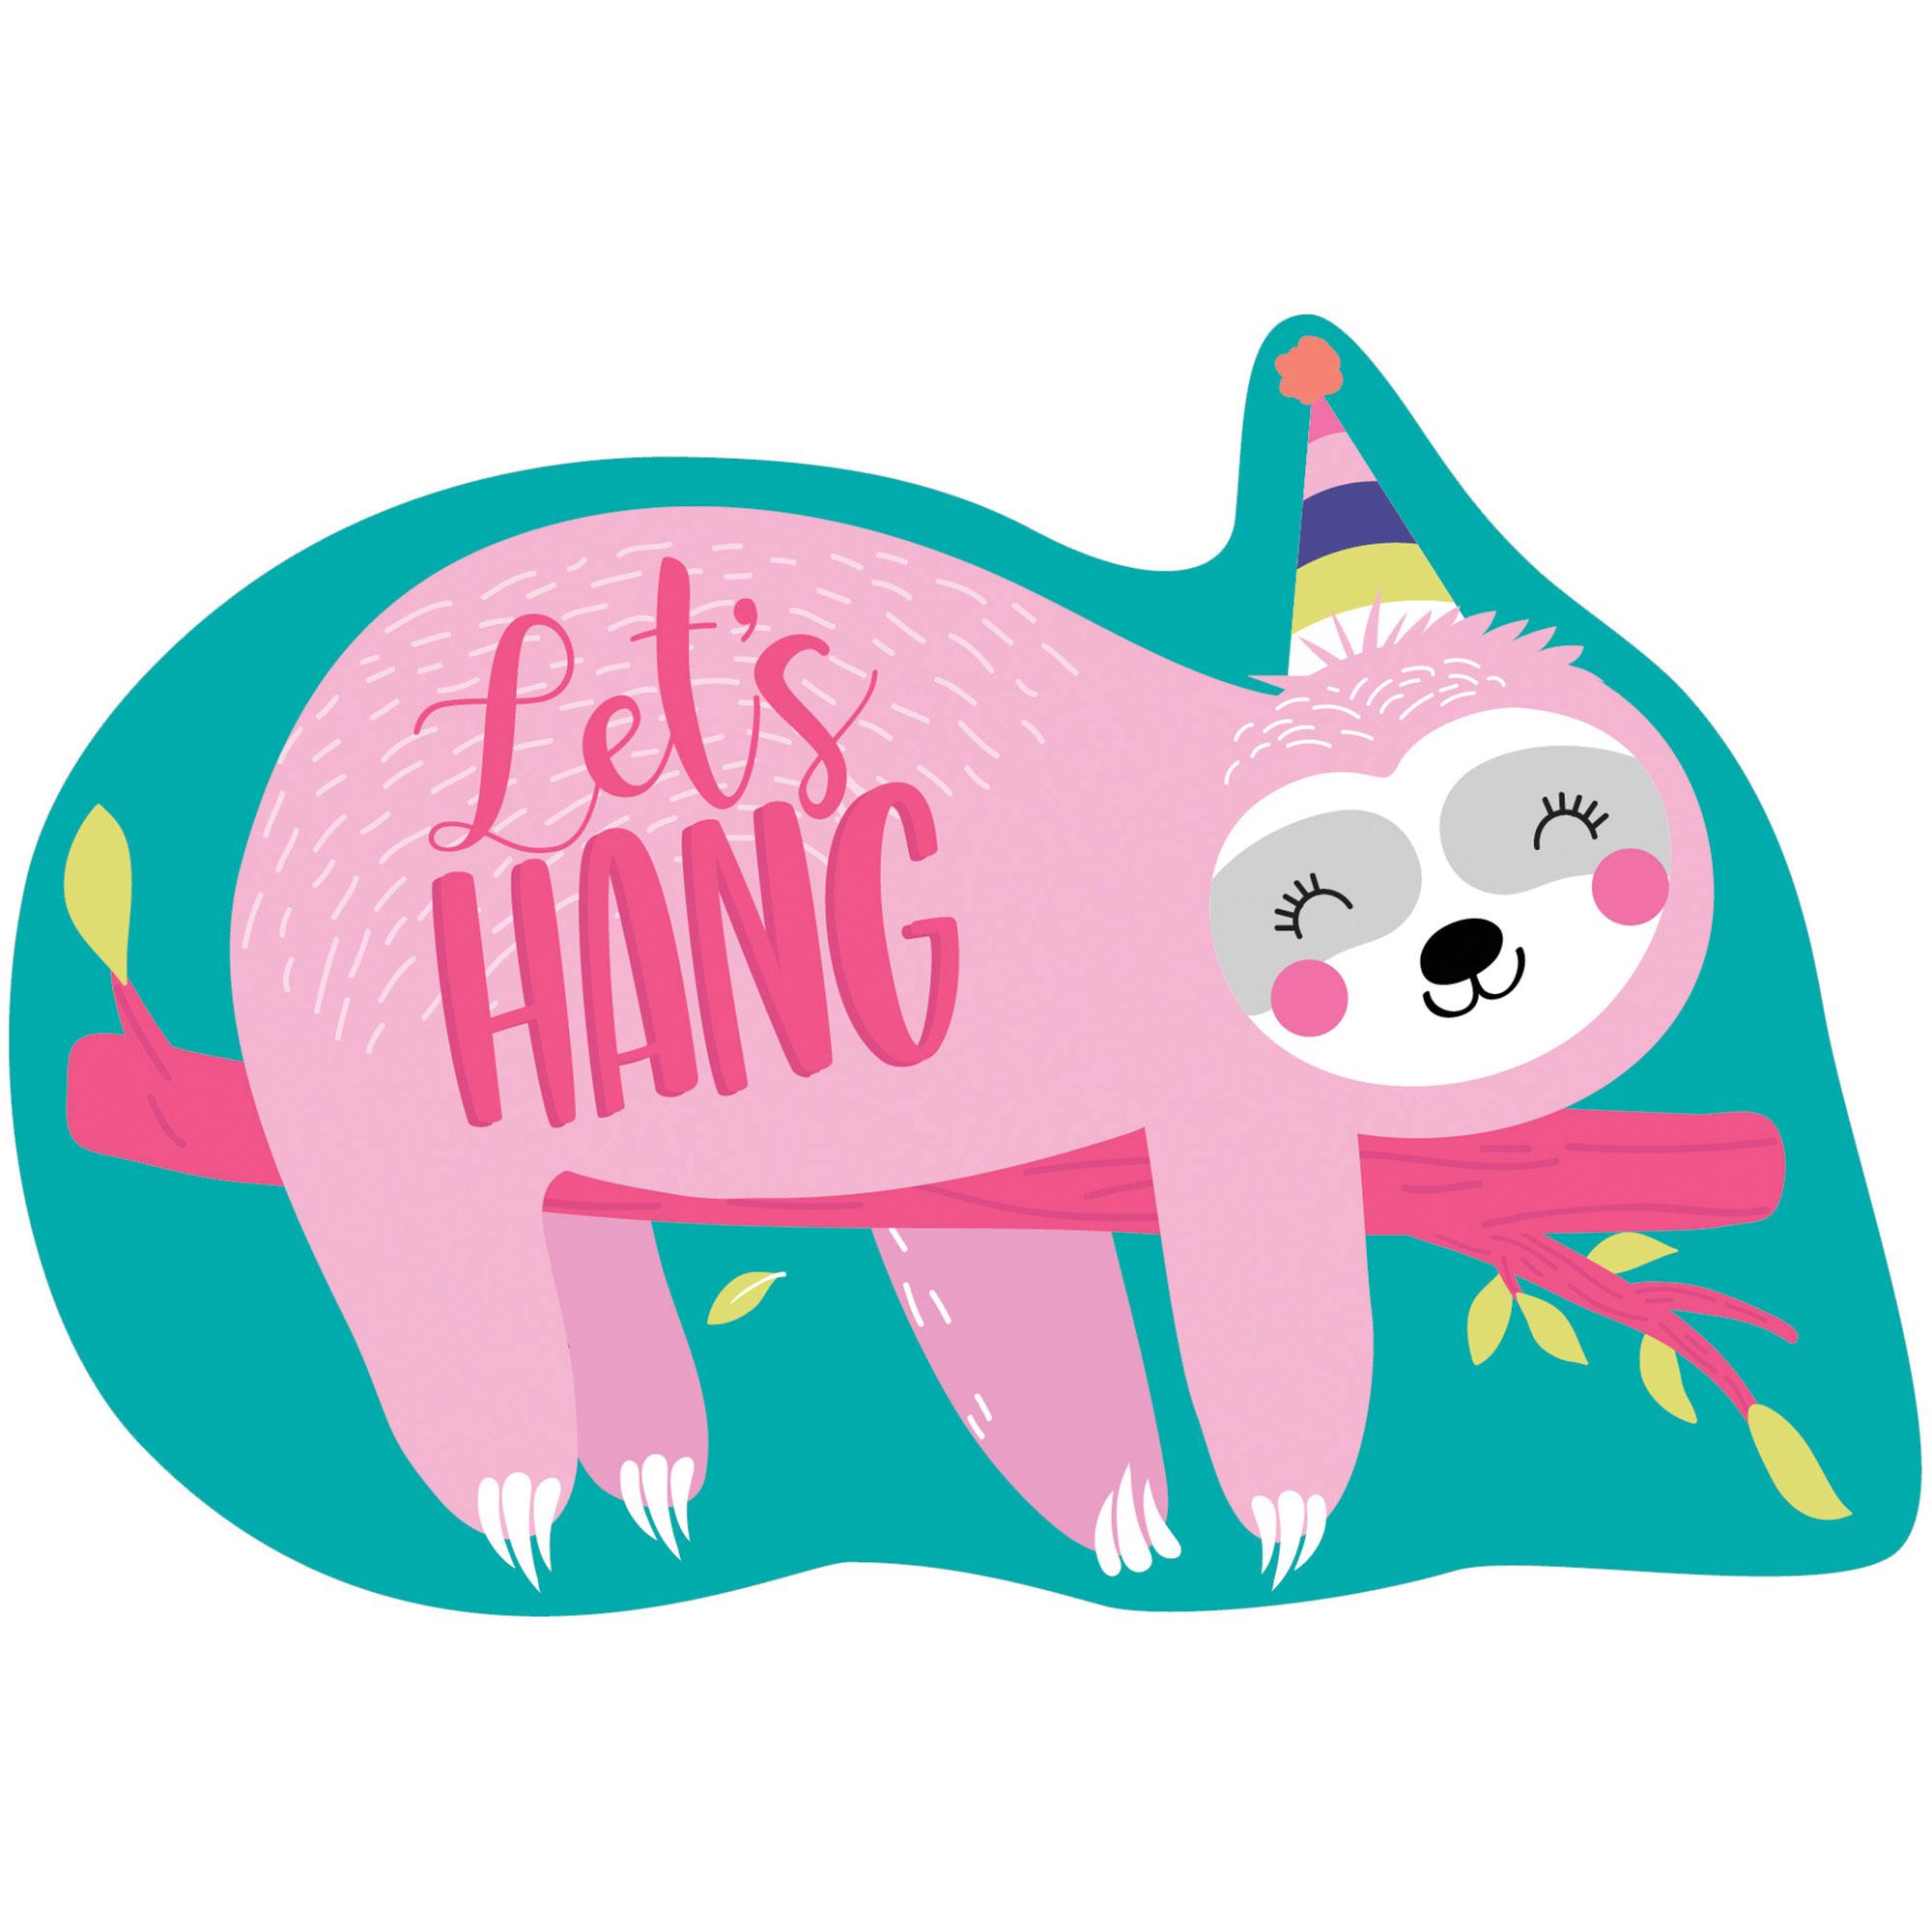 Sloth Postcard Invitations Let's Hang